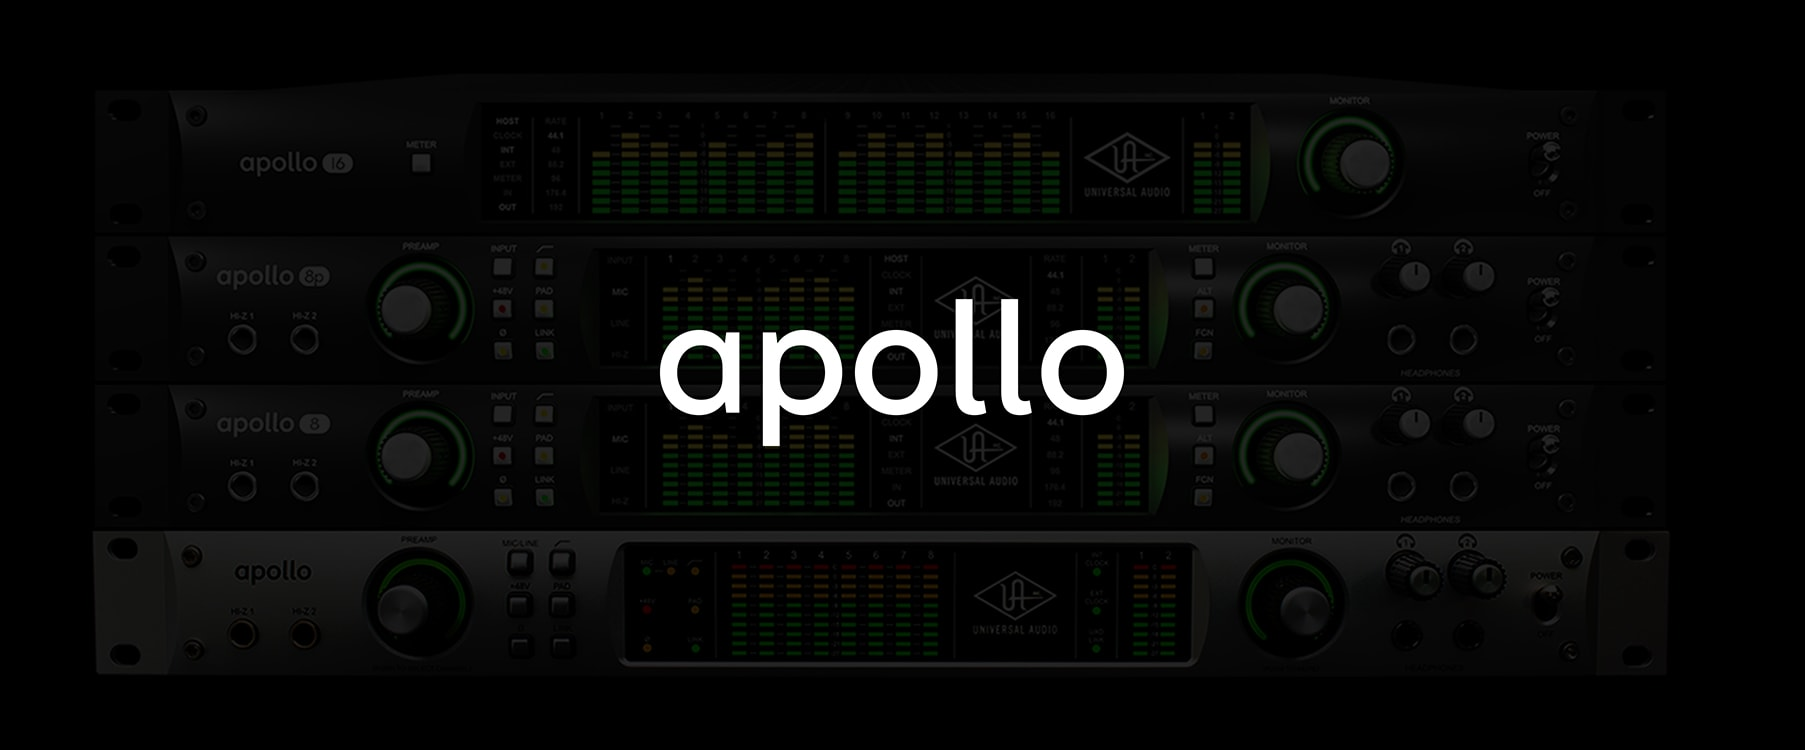 Apollo High Resolution Audio Interface Basics & FAQ